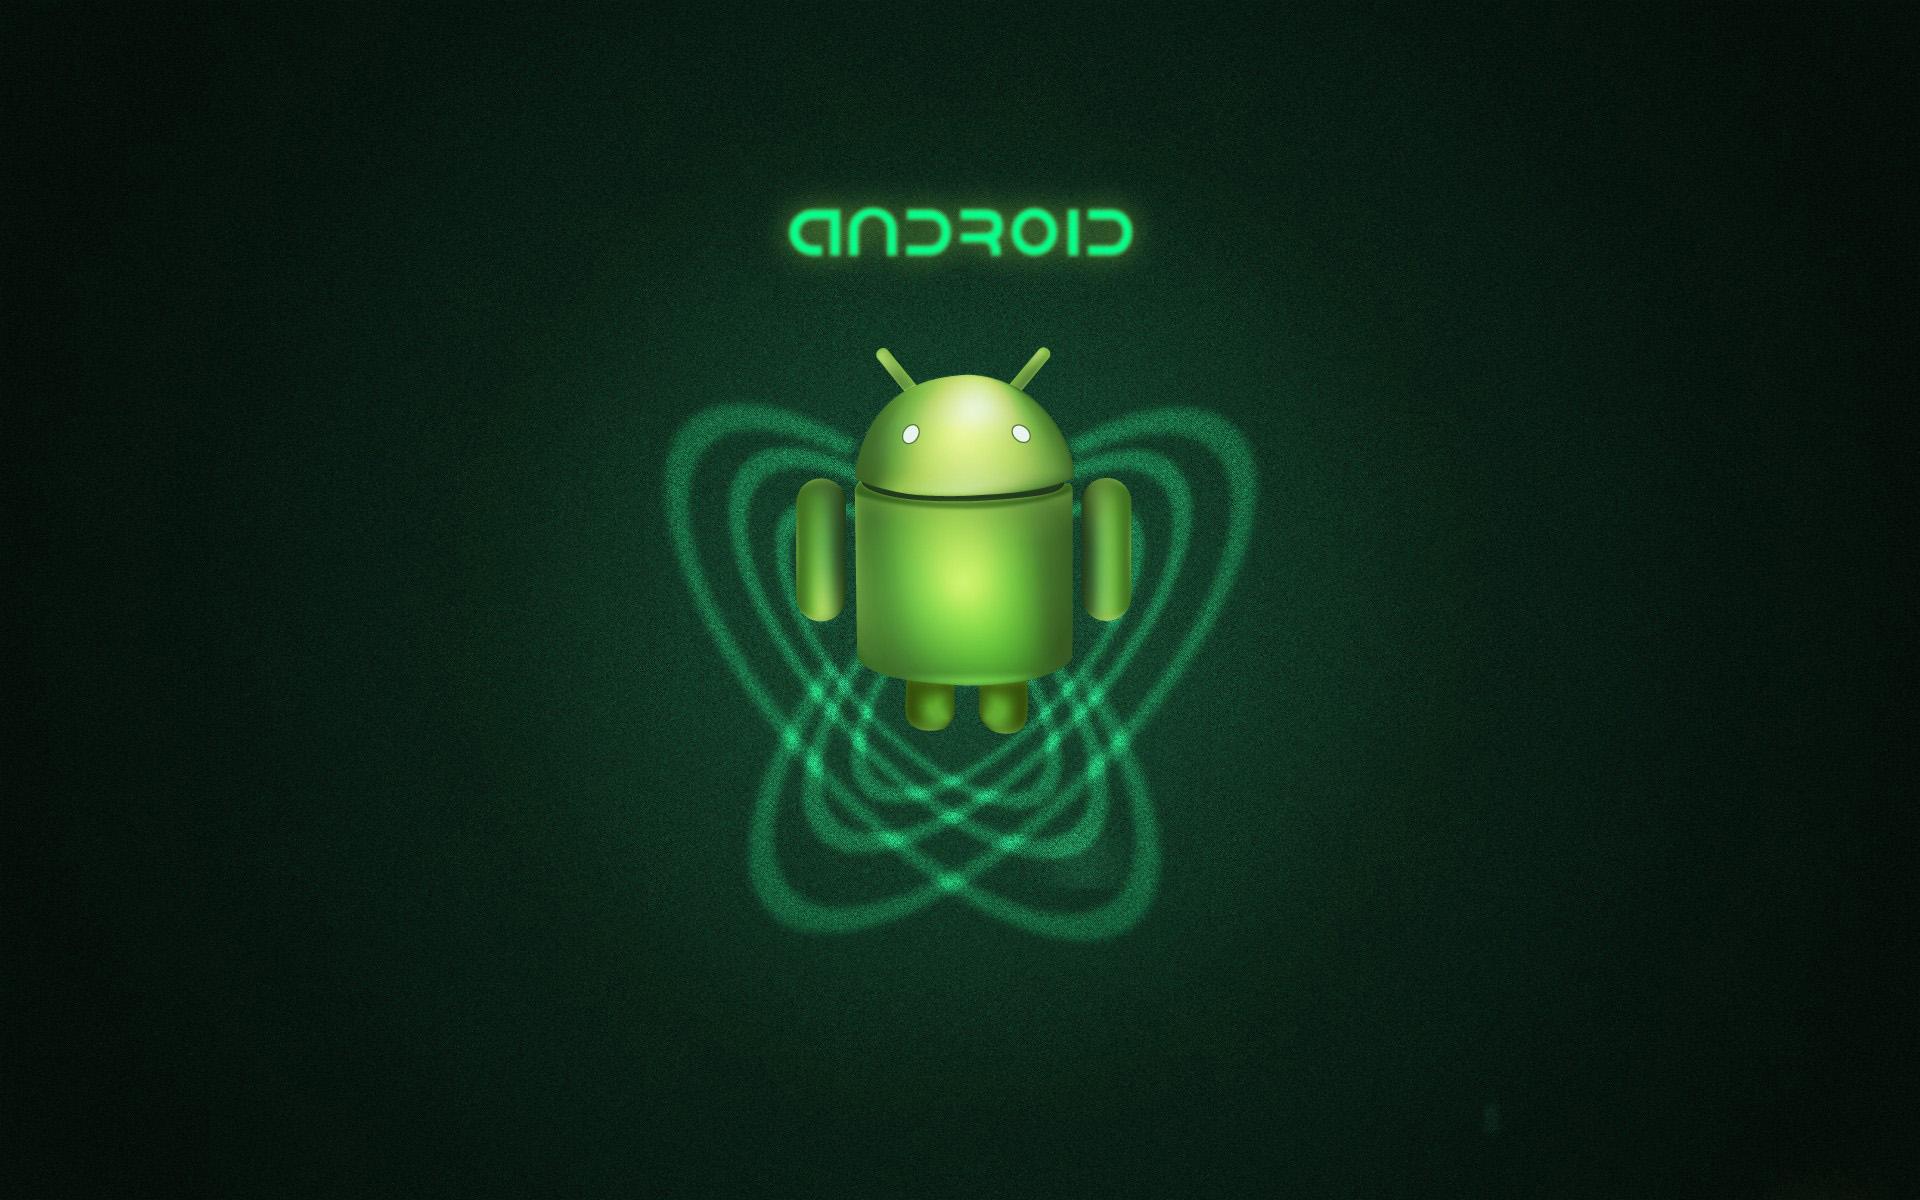 фото на андроид на обои